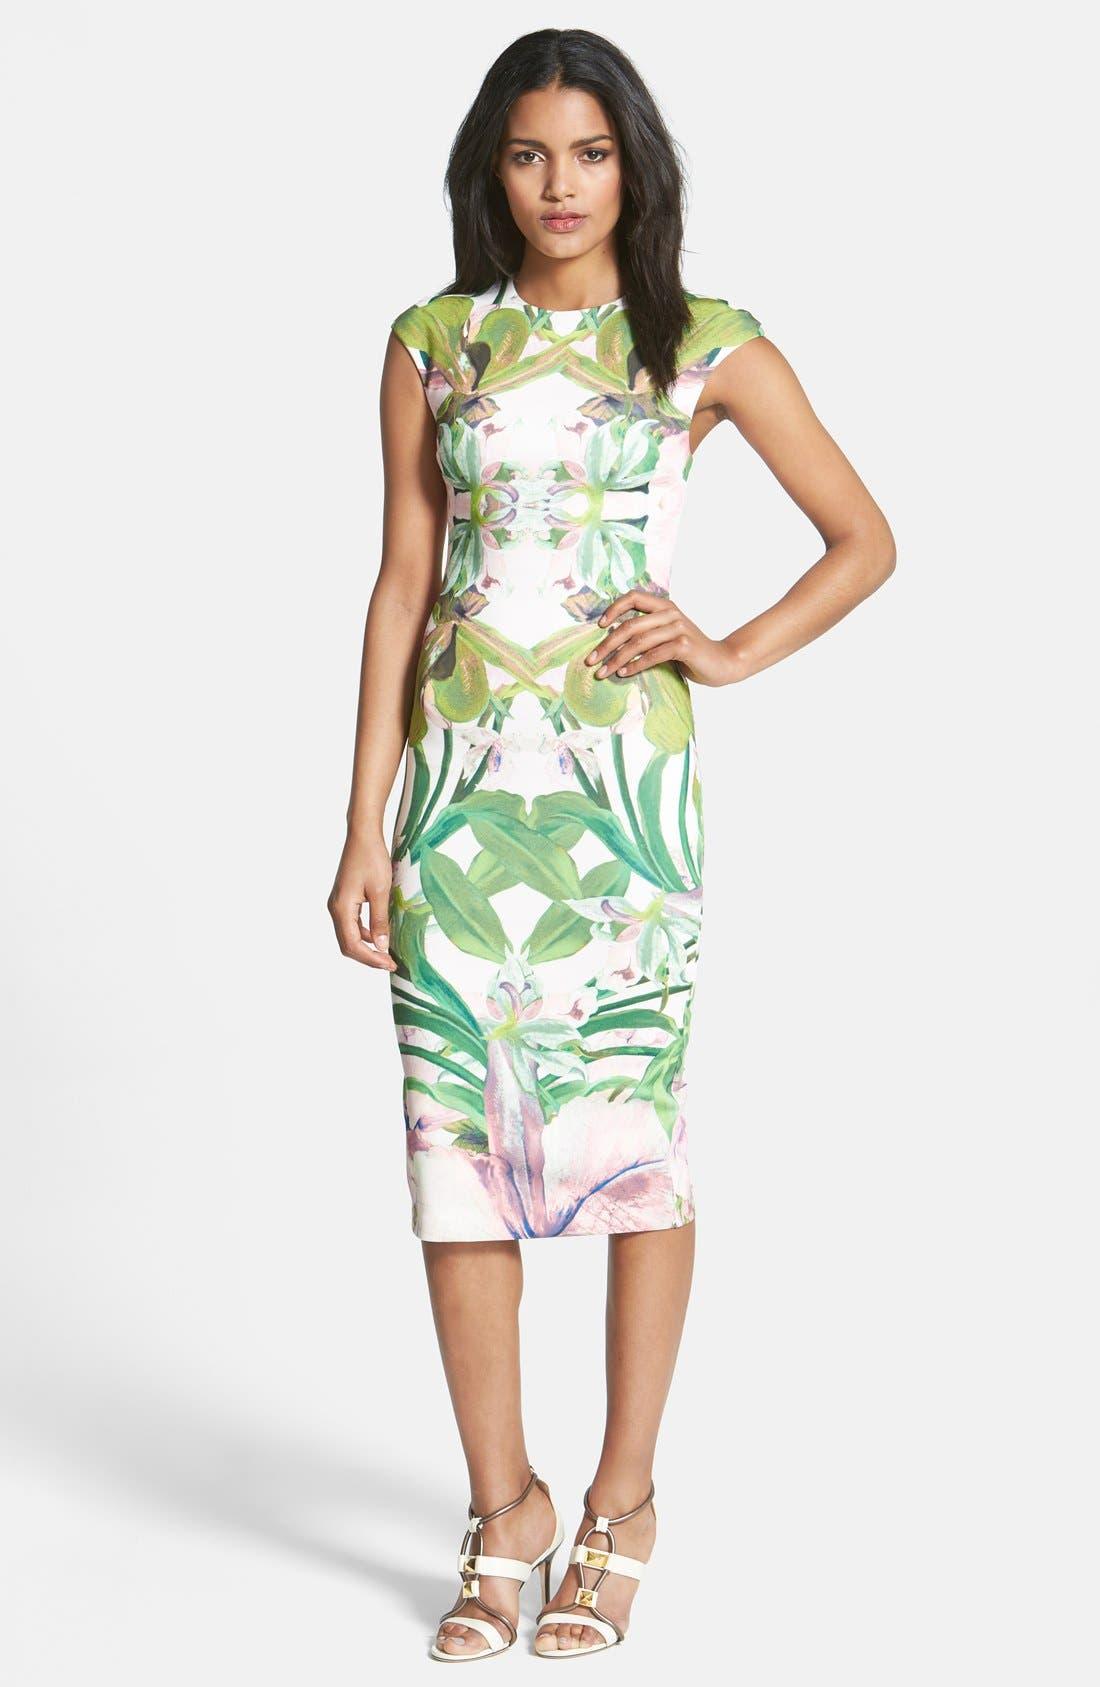 Alternate Image 1 Selected - Ted Baker London 'Jungle Orchid' Print Dress